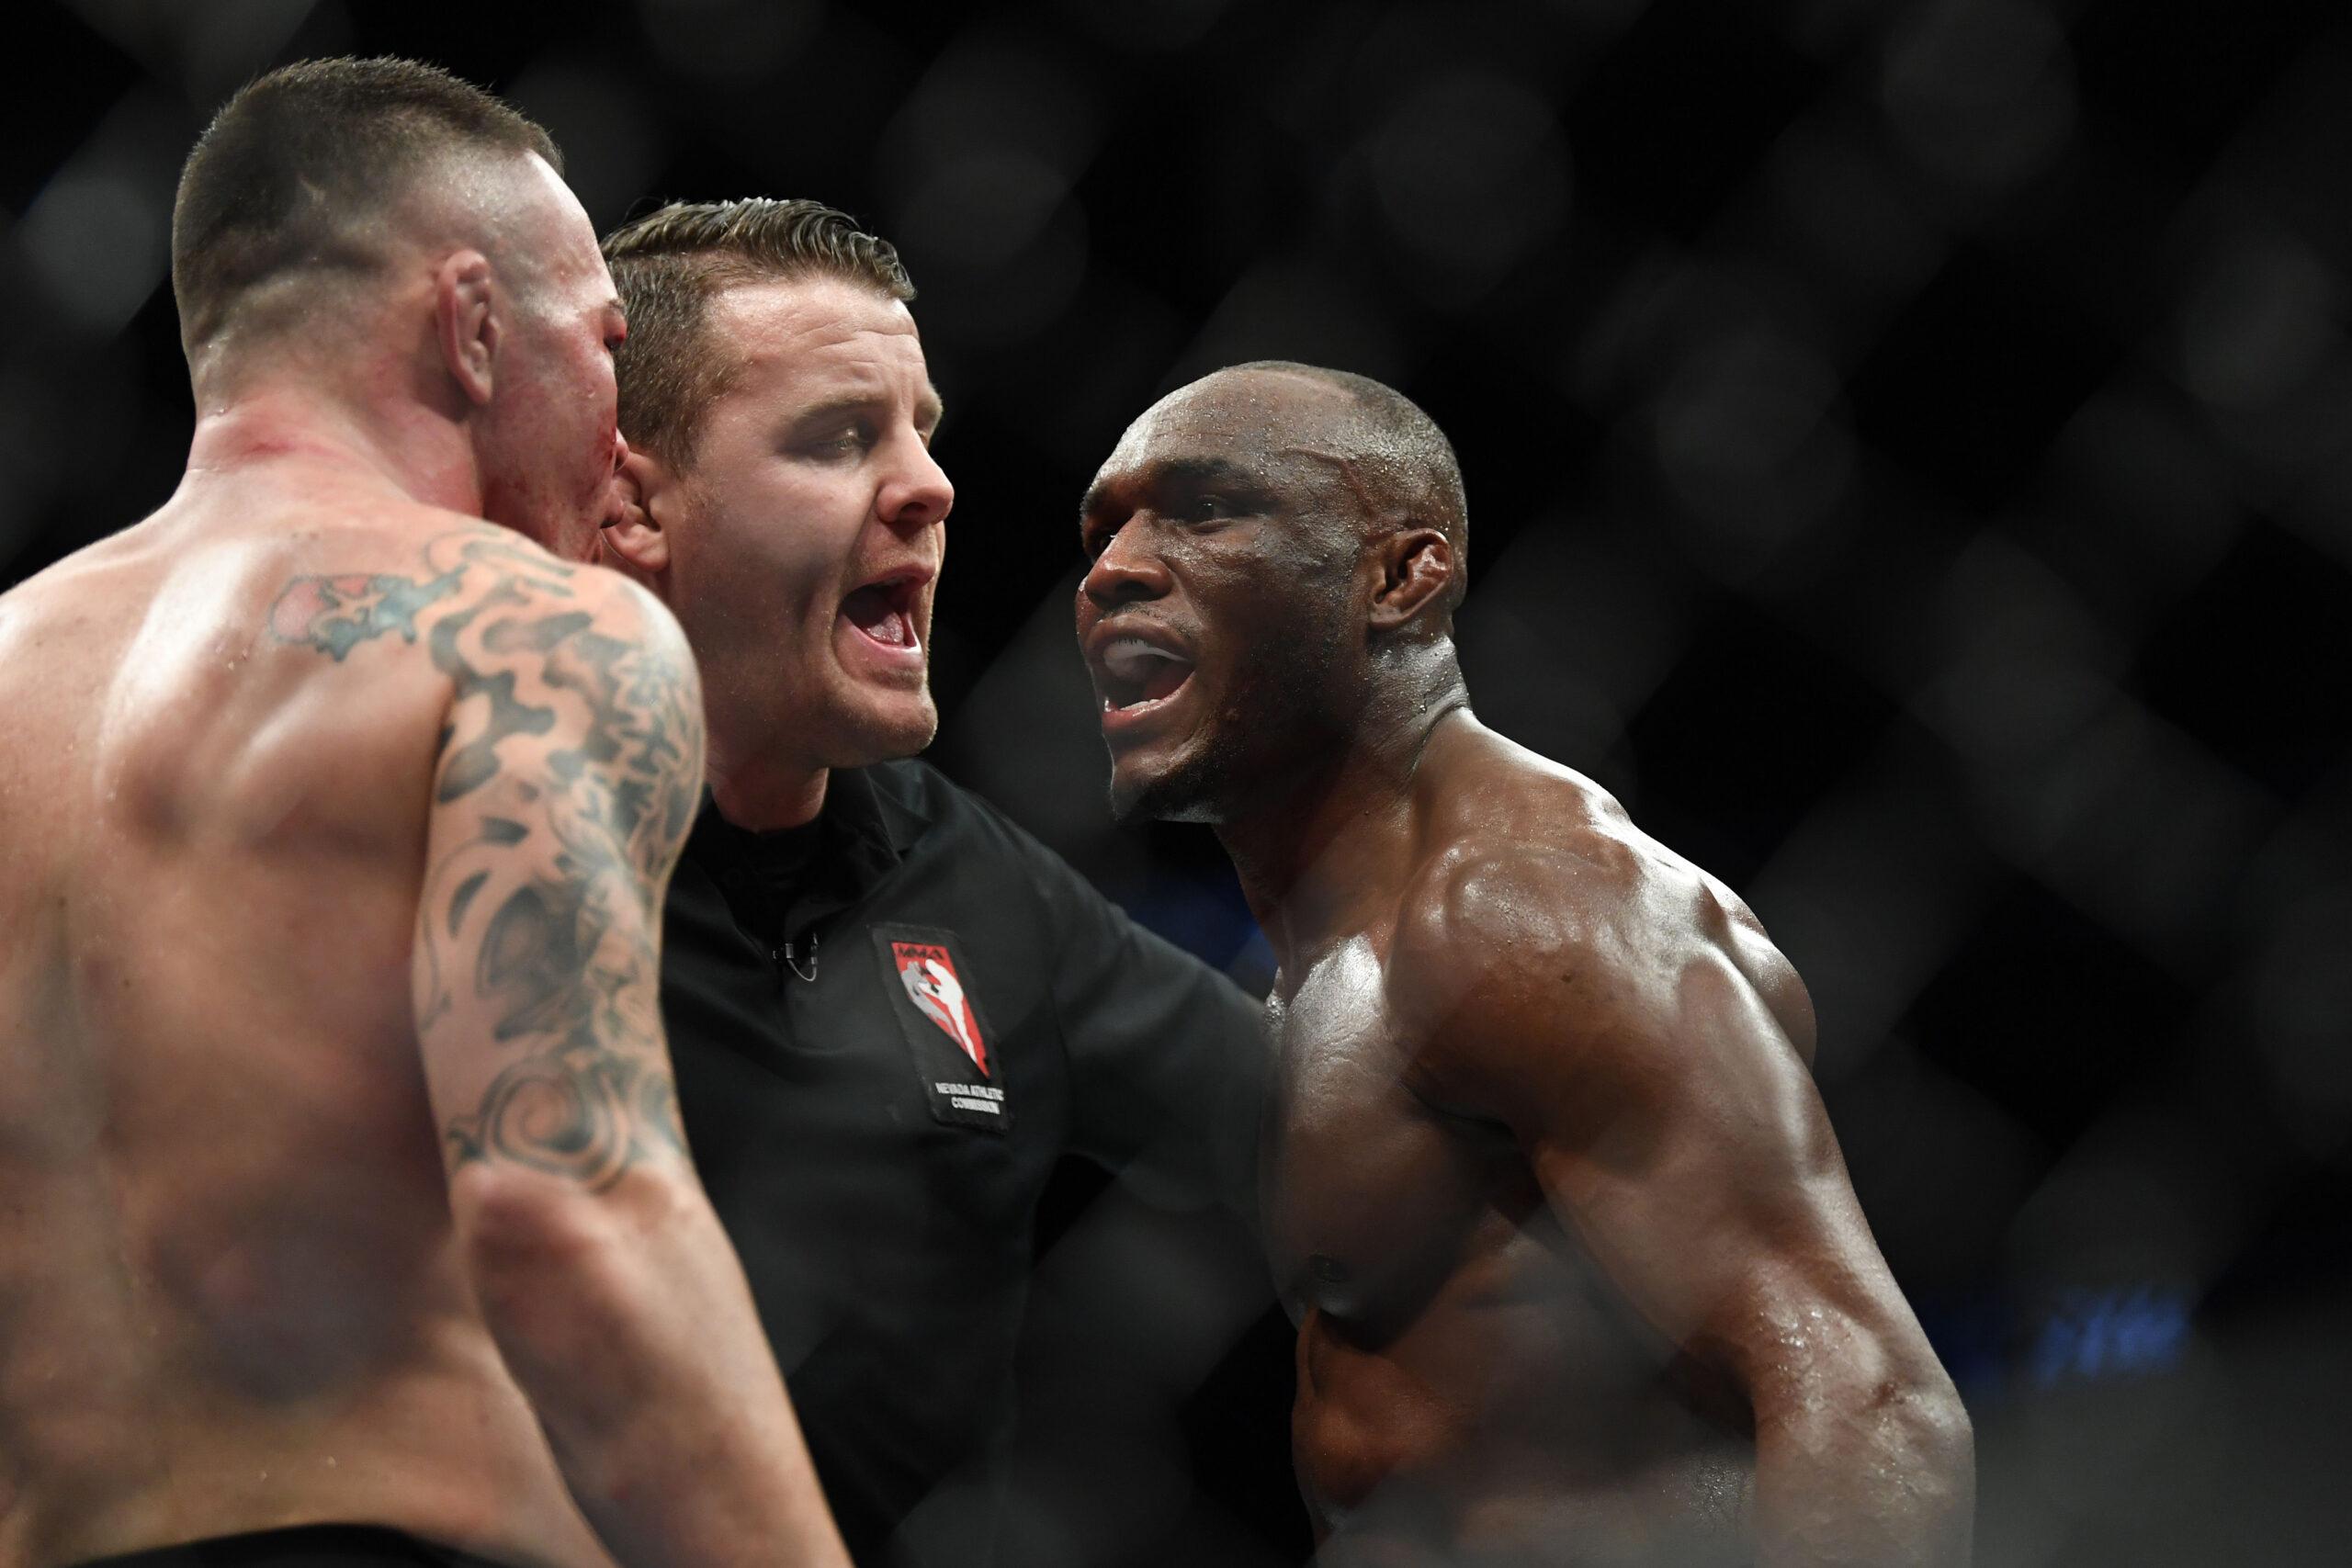 Kamaru Usman To Face Colby Covington Again, Rematch Slated For UFC 268